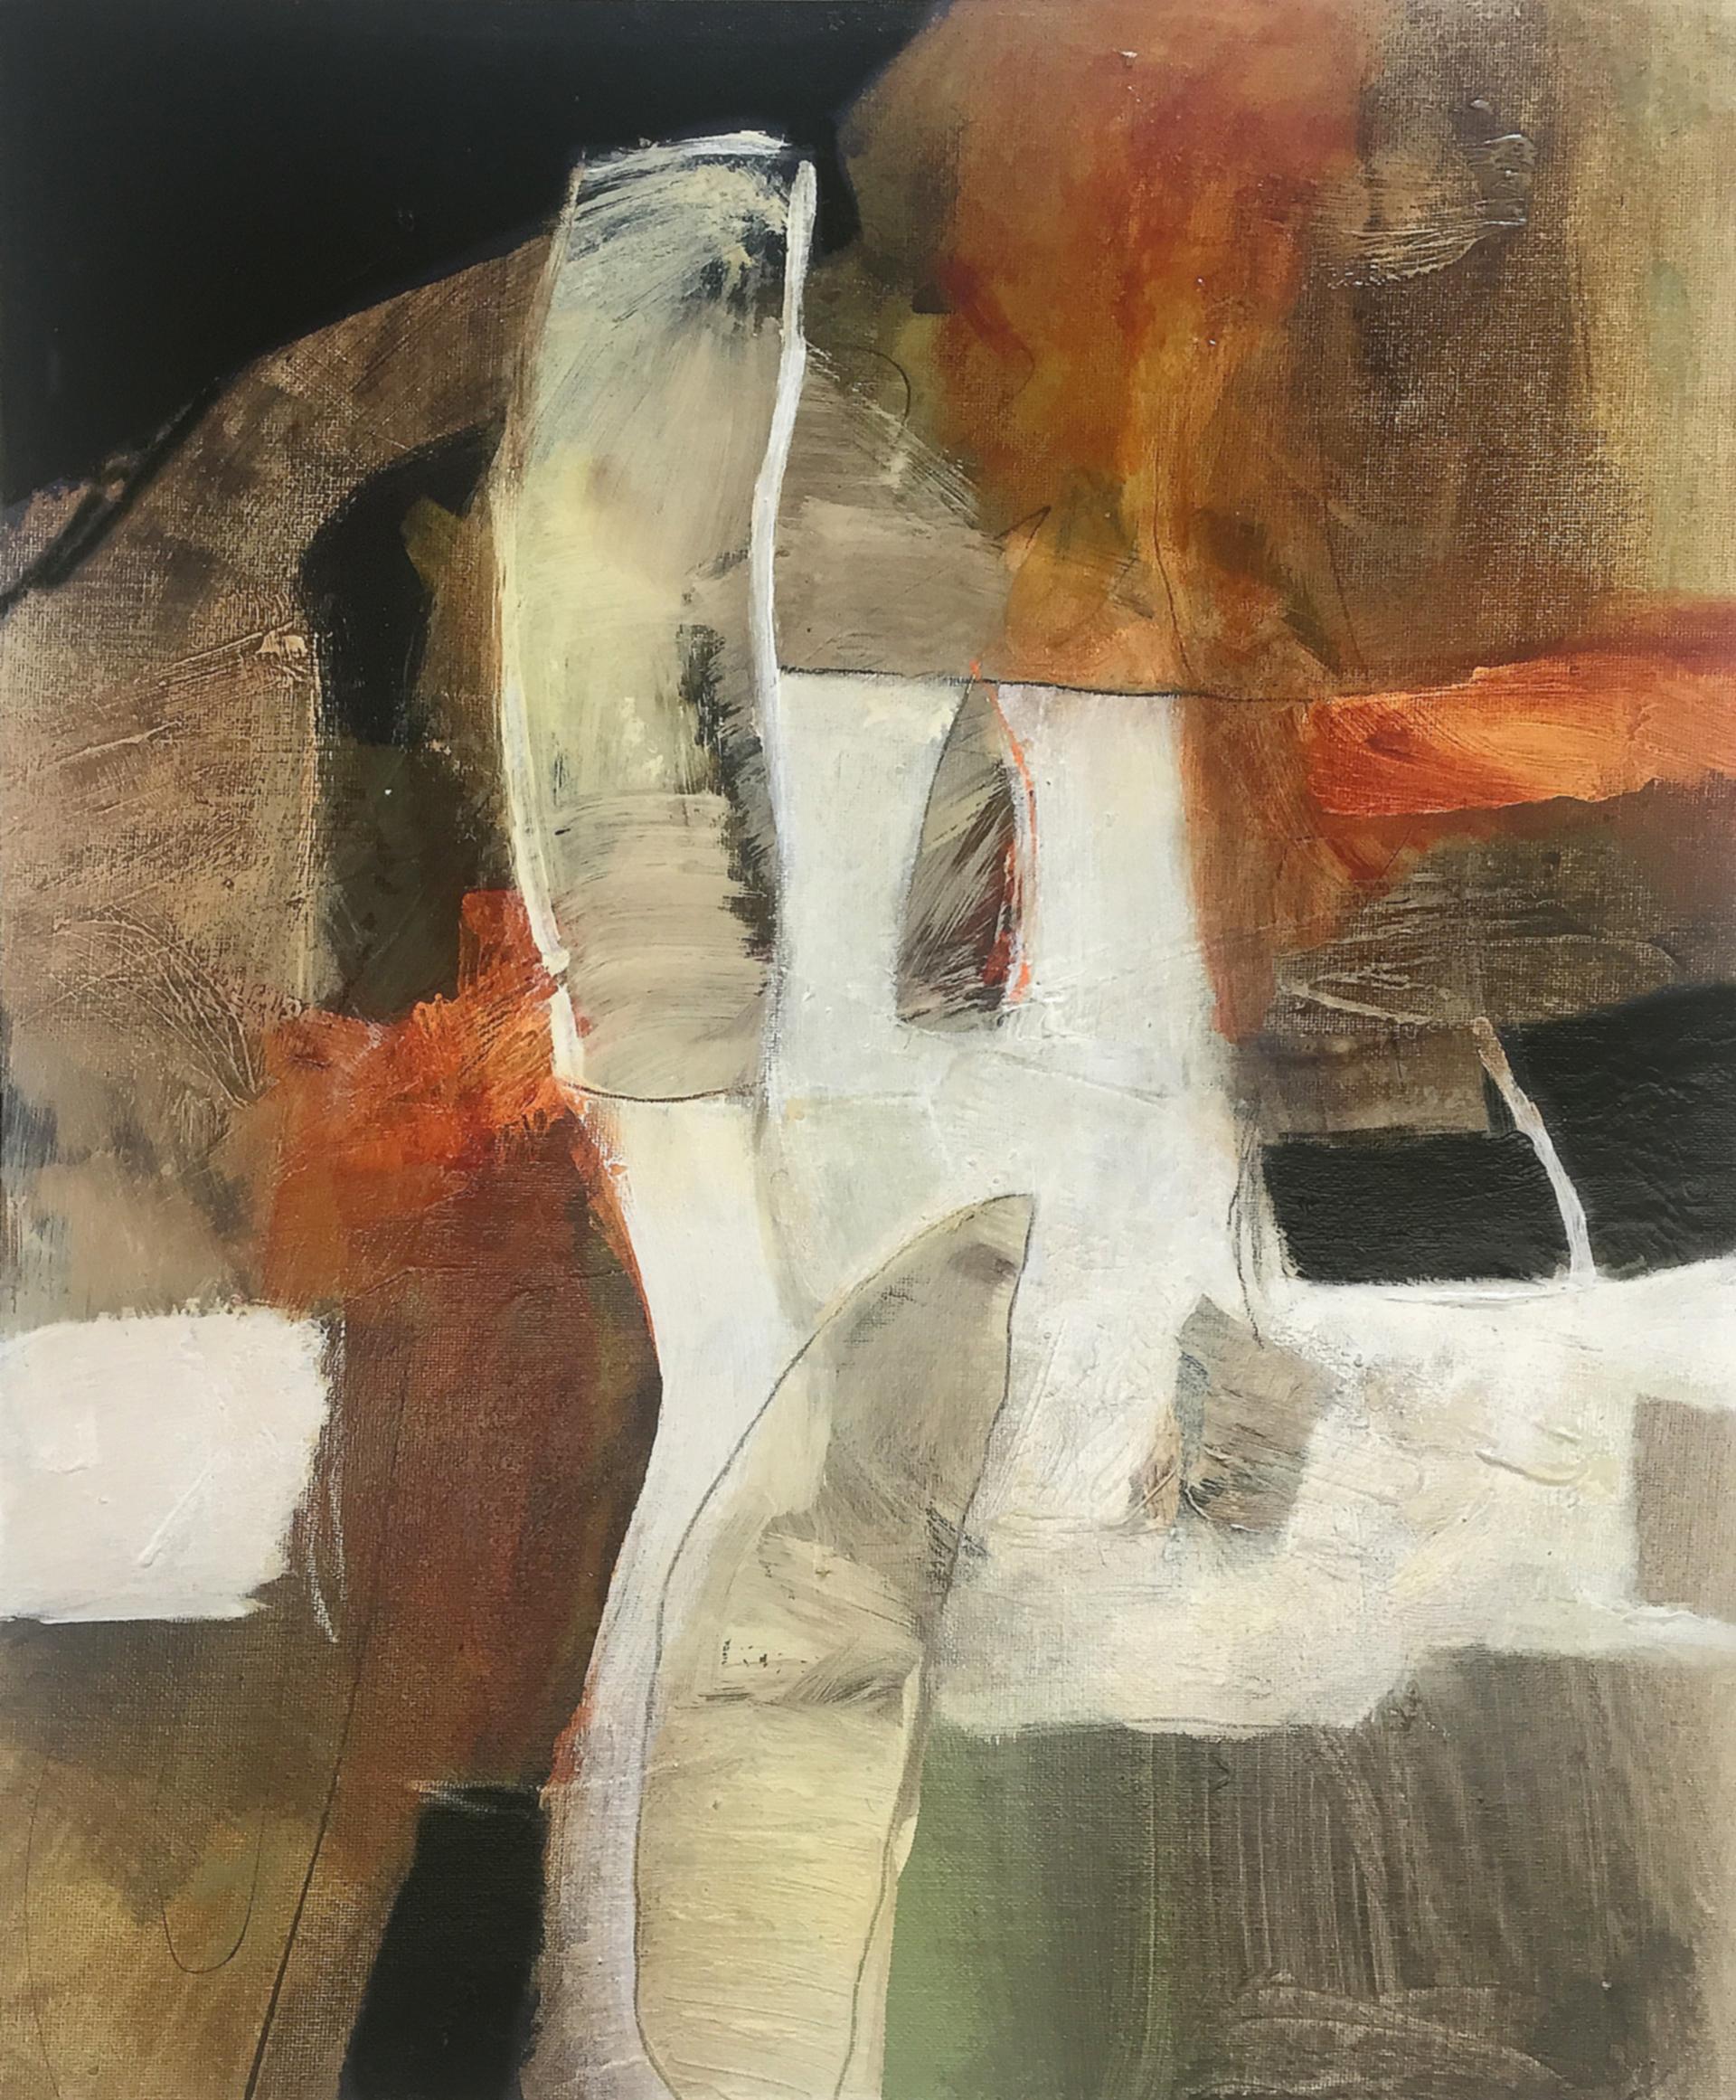 Untitled 198580 by Karen Roehl